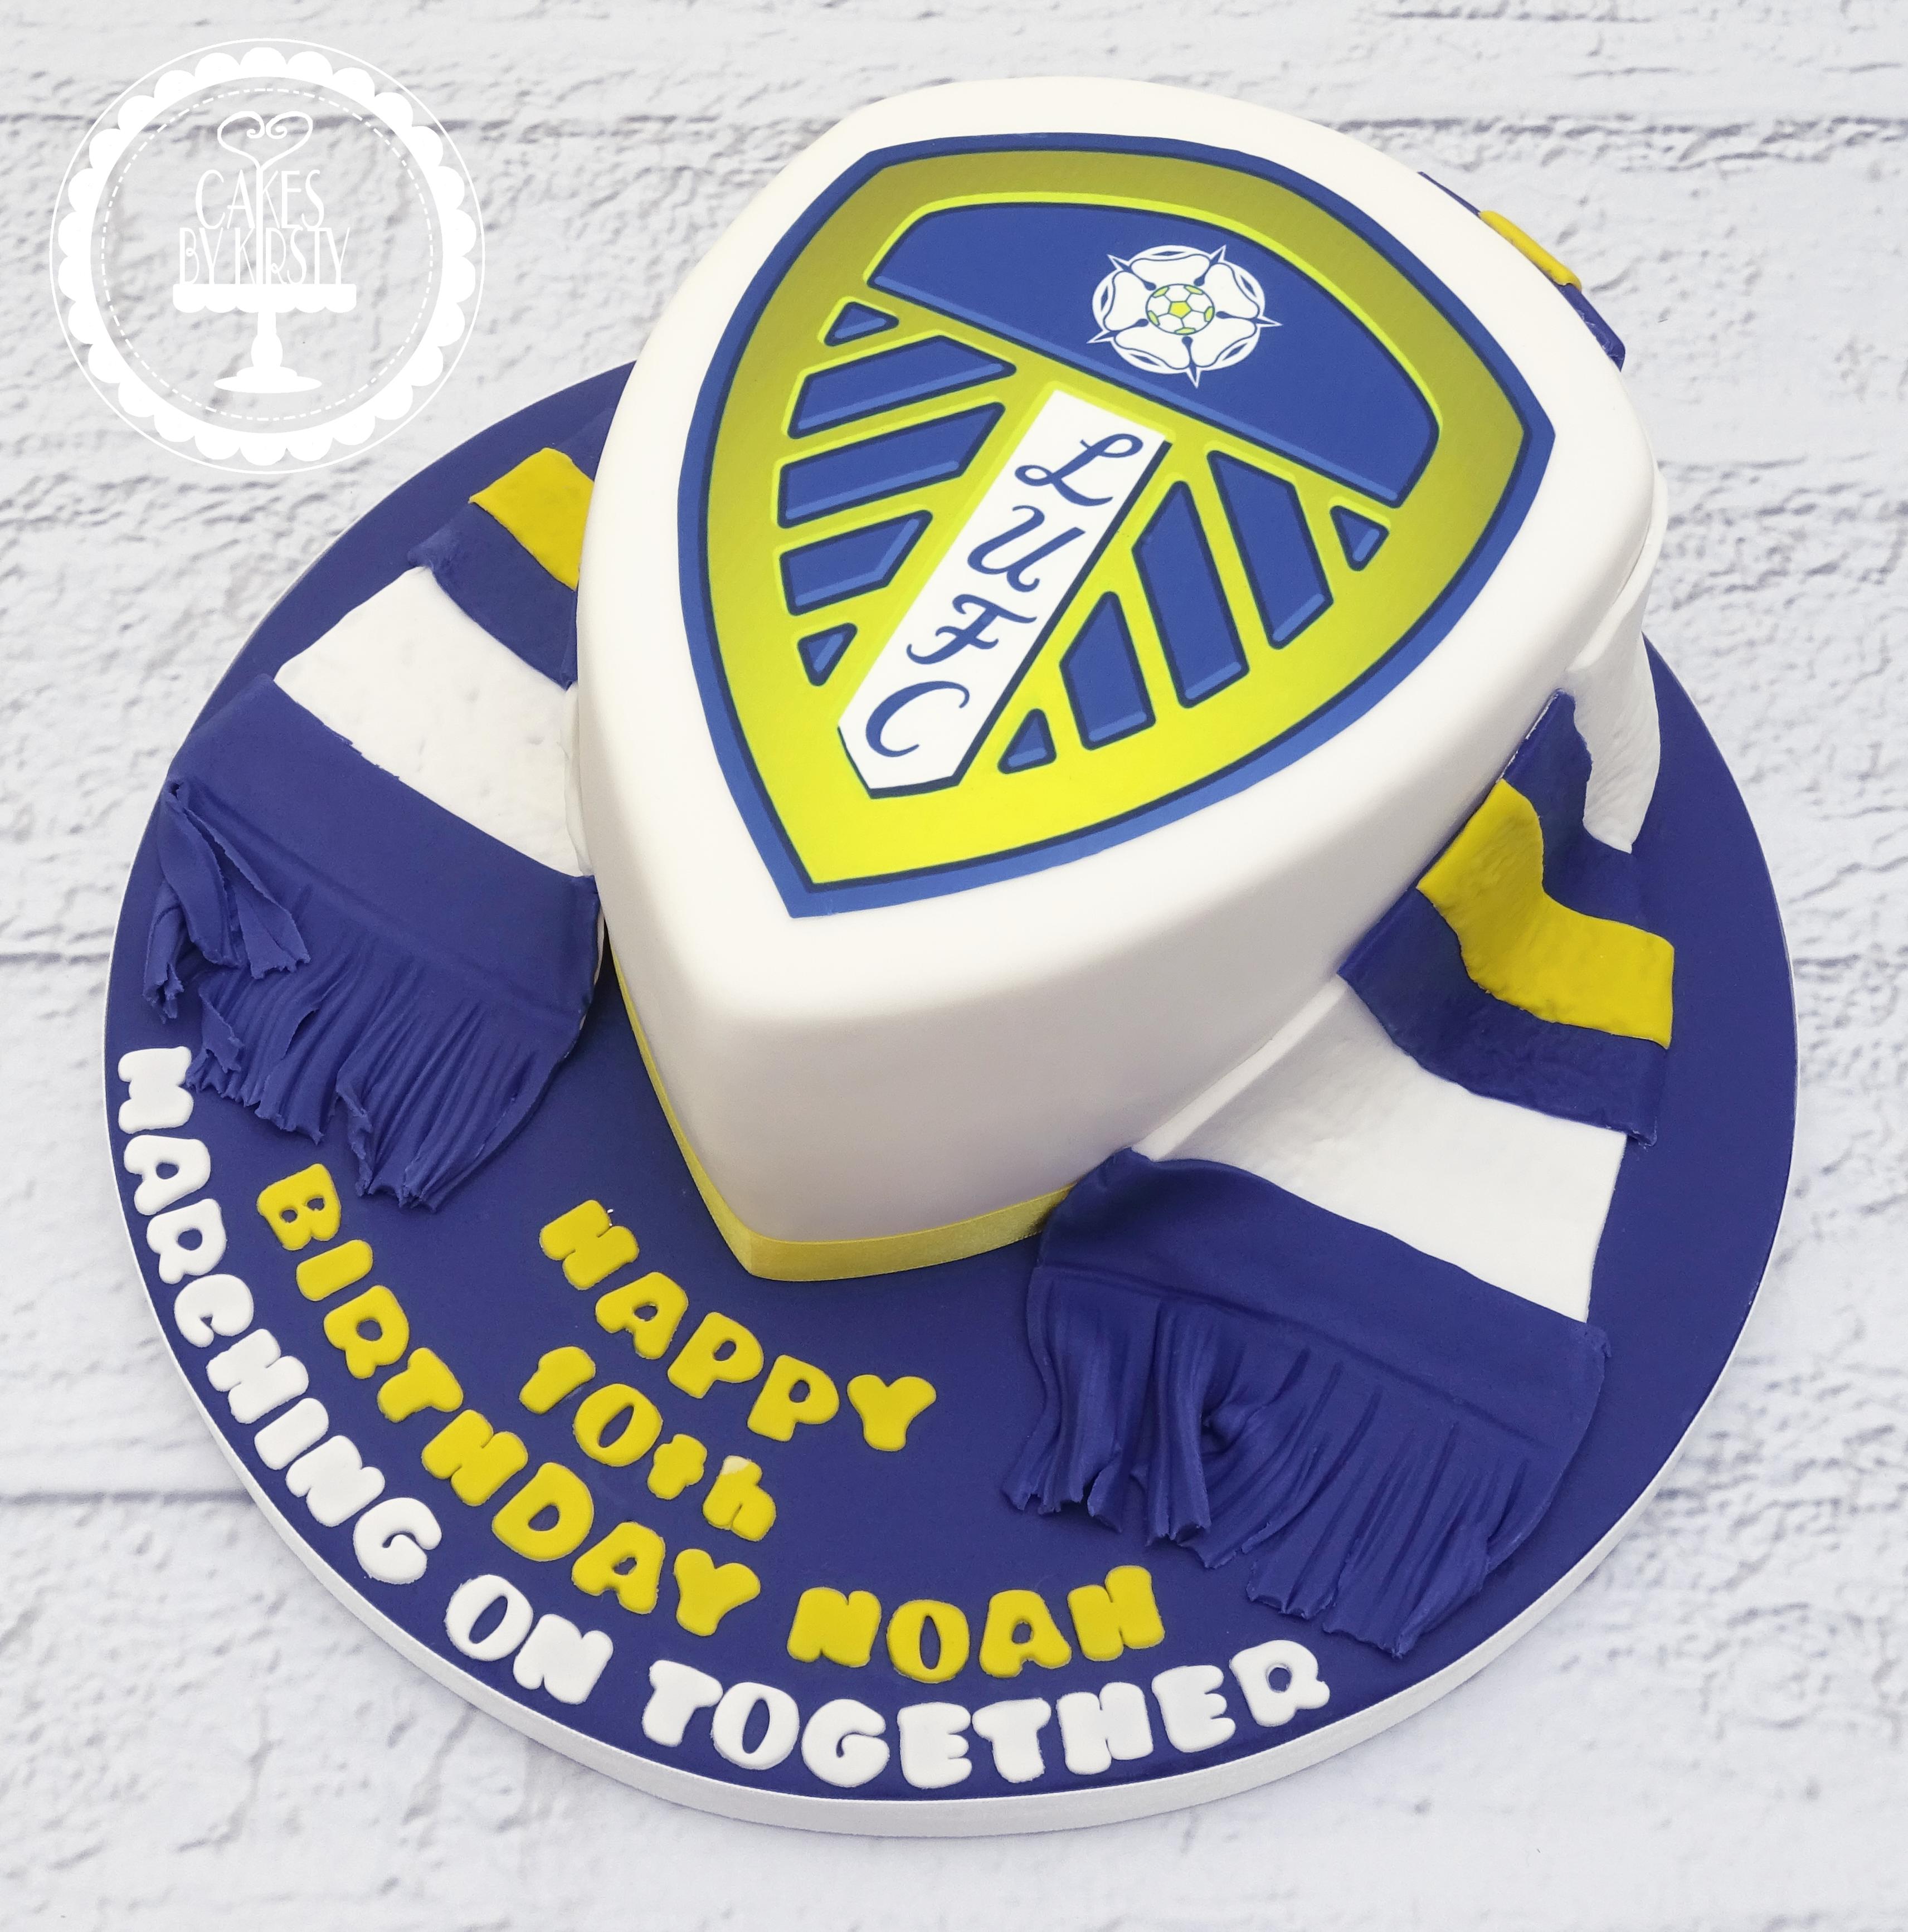 Leeds United 10th Birthday Cake